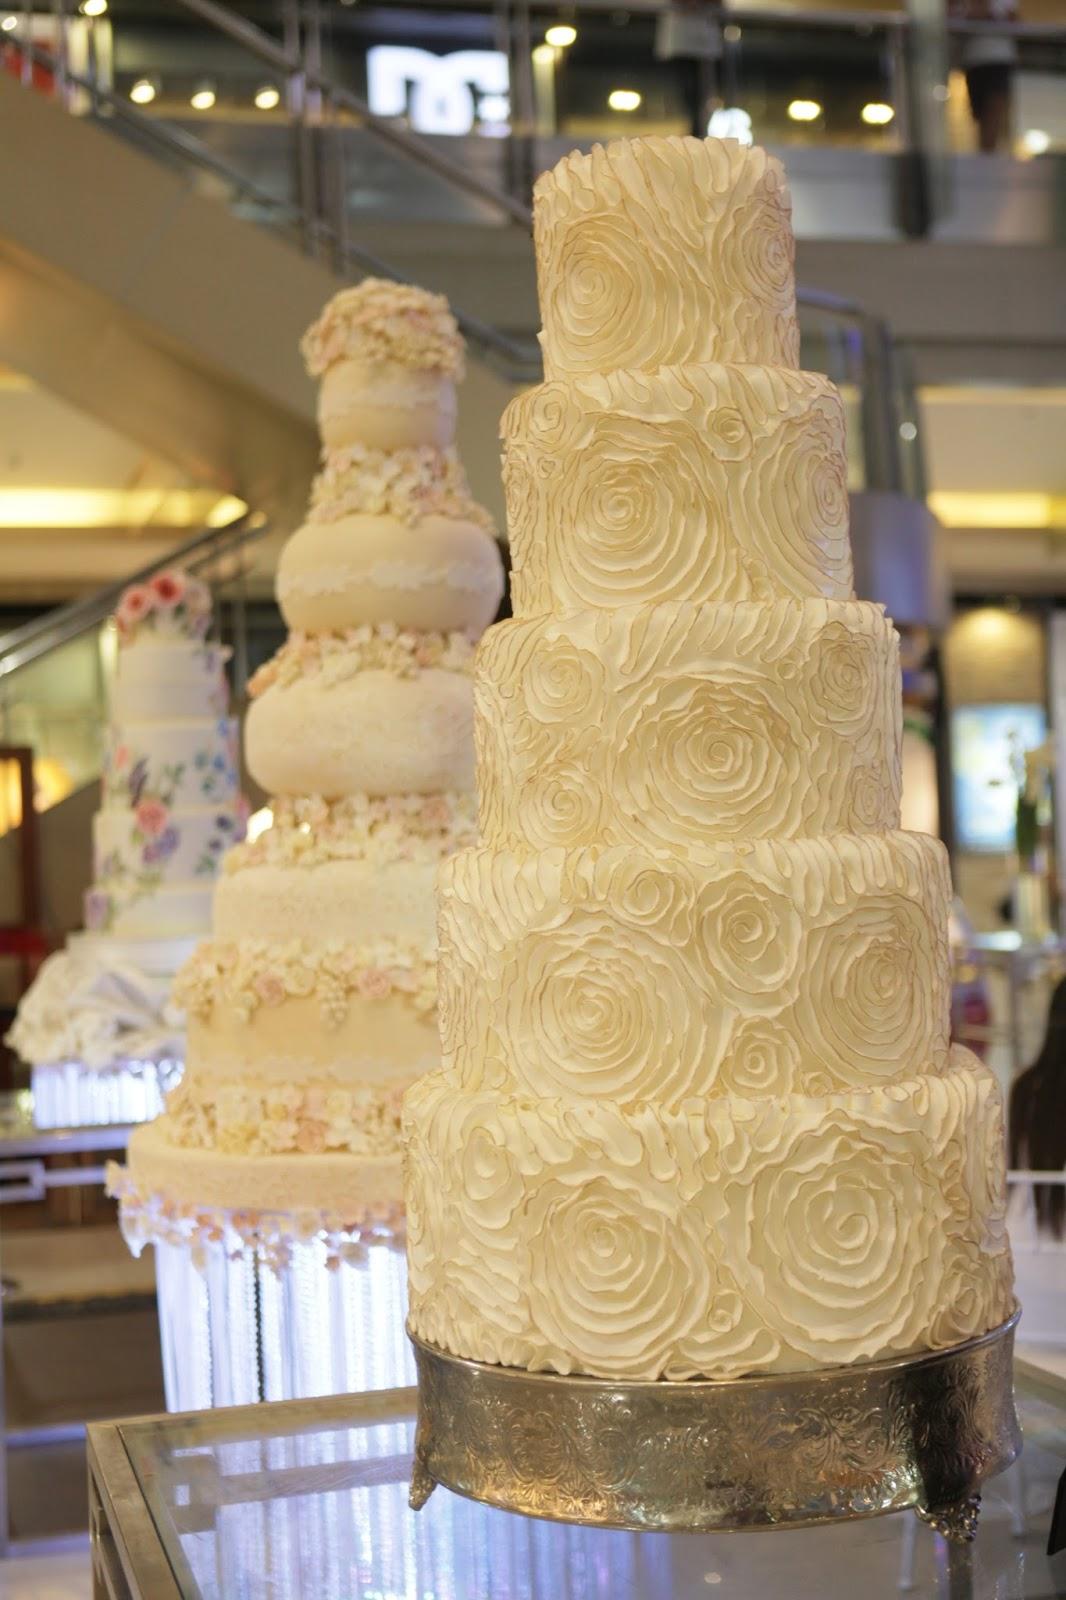 Weddings at the Blu: A Bridal Fair by Radisson Blu Cebu | Radisson ...